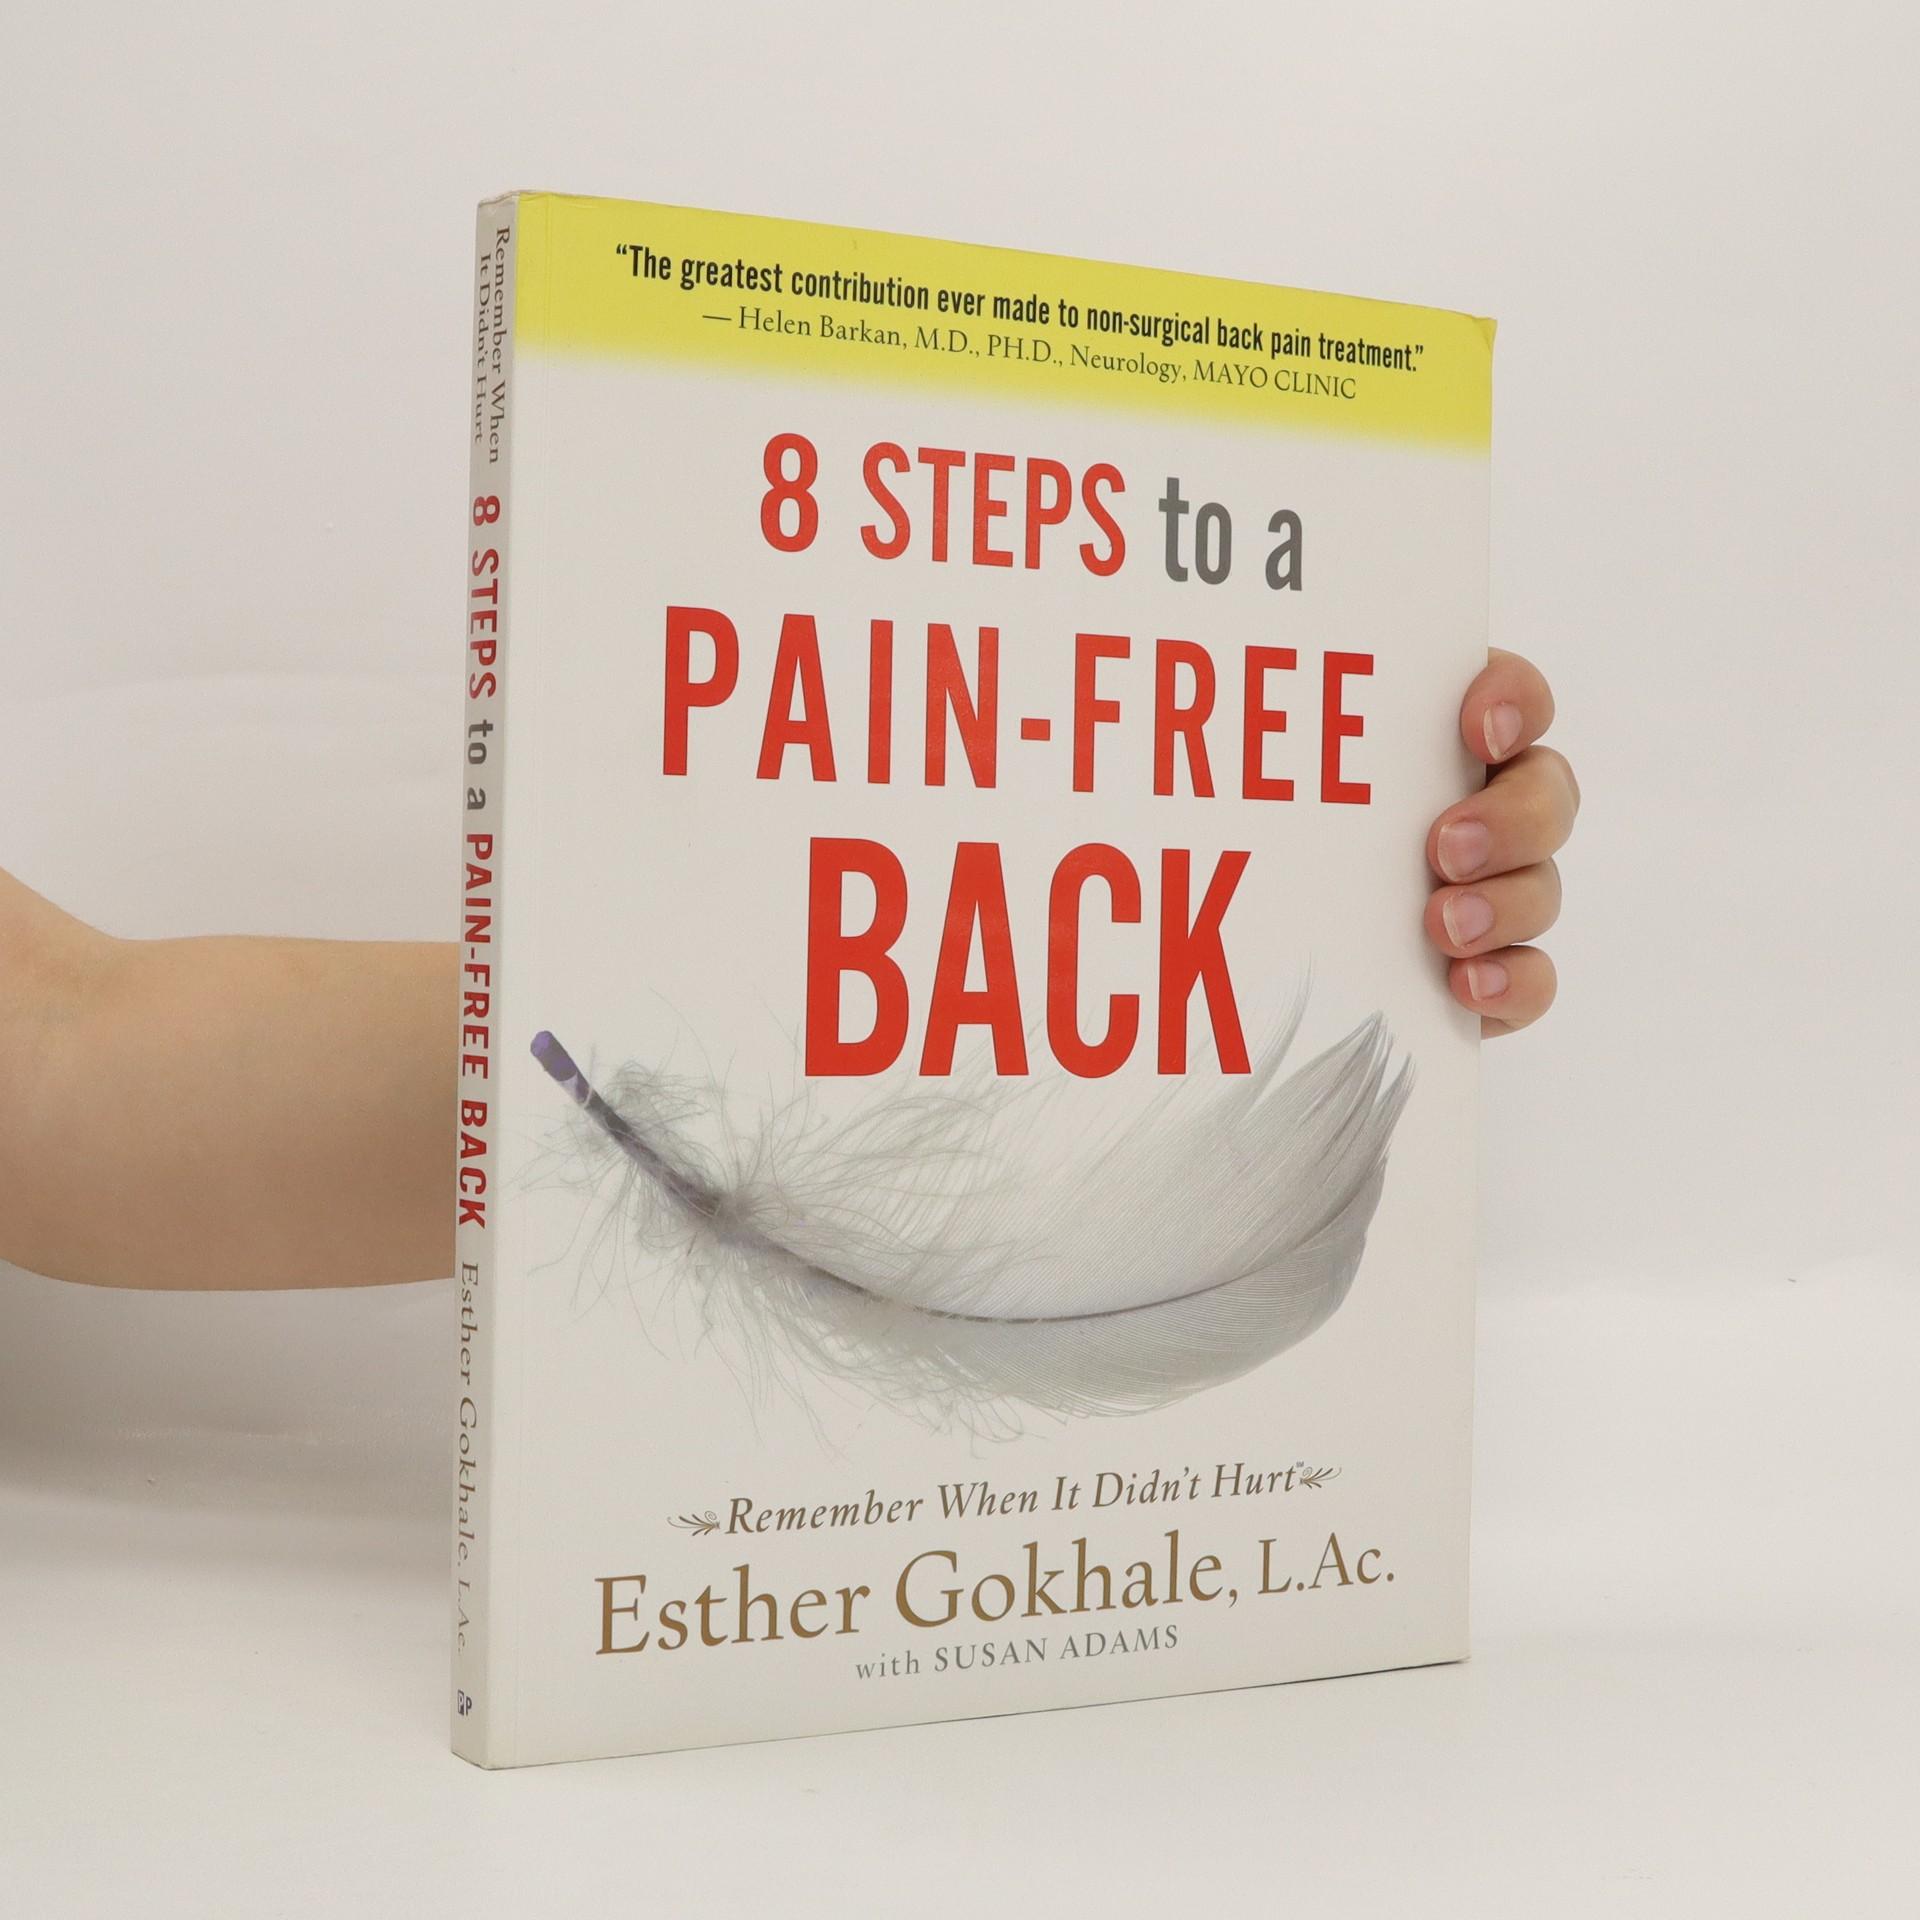 antikvární kniha 8 Steps to a Pain-free Back, 2008